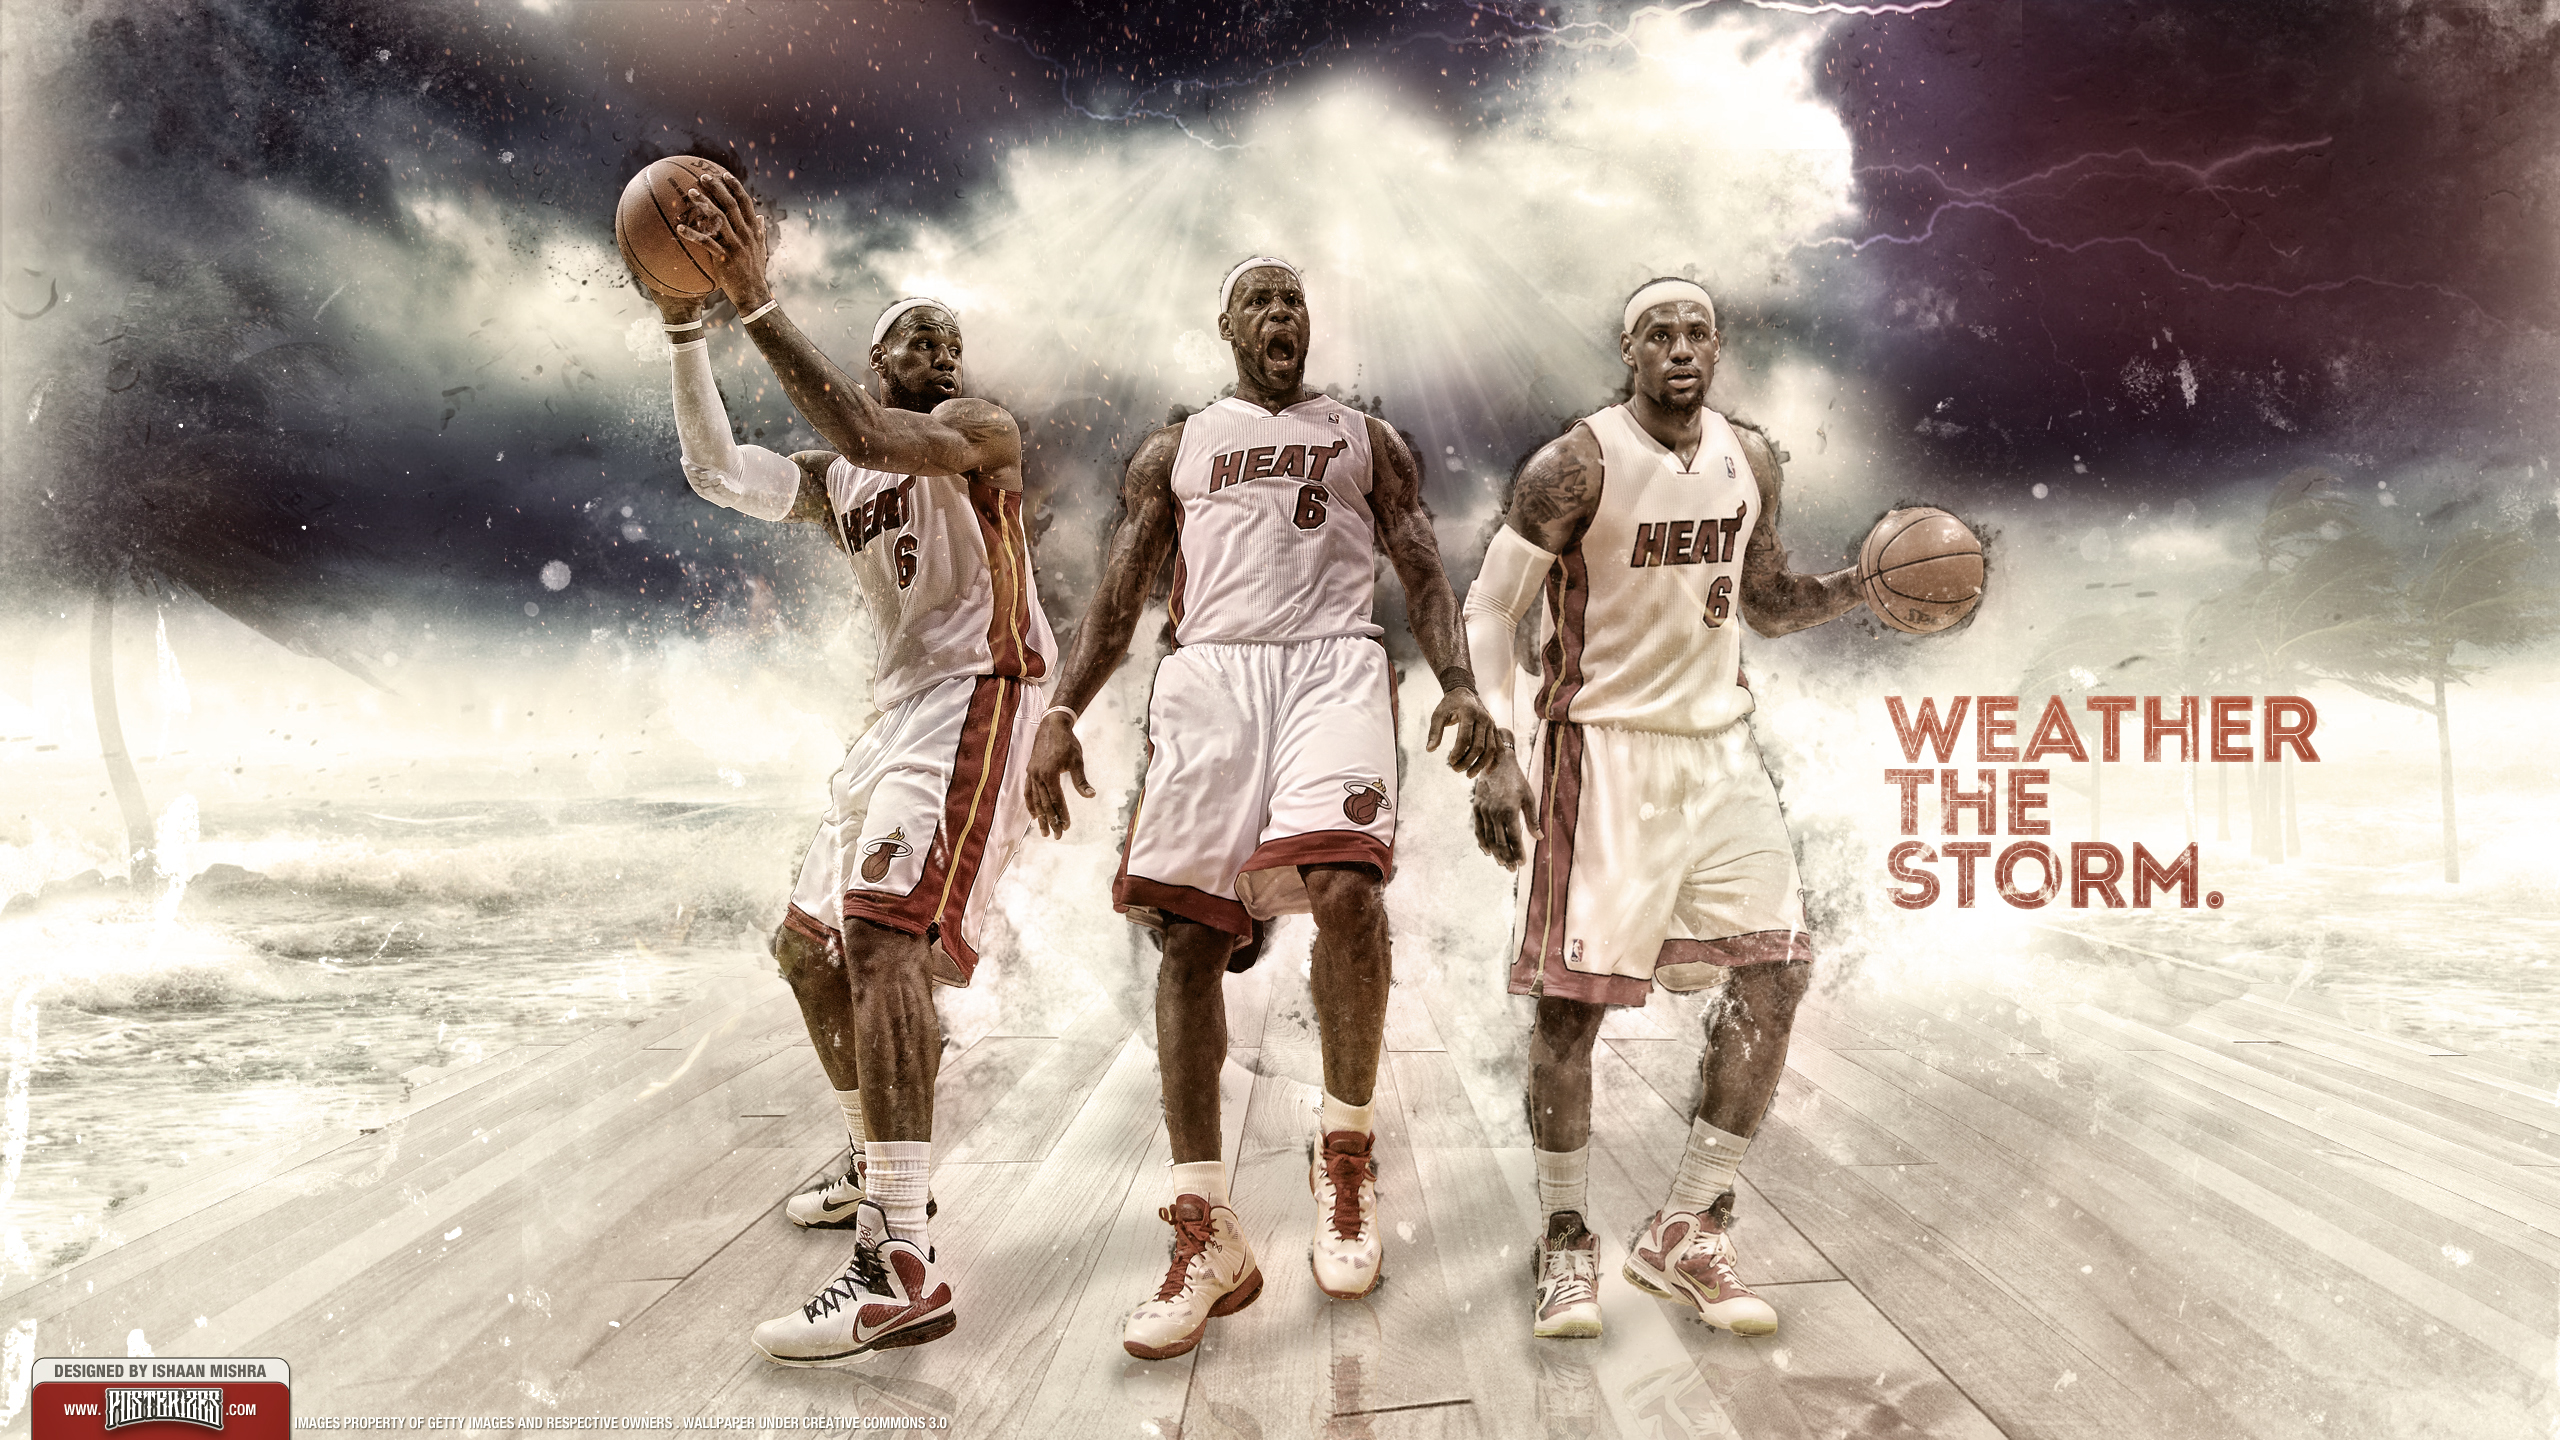 LeBron James 2012 Finals Wallpaper by Angelmaker666